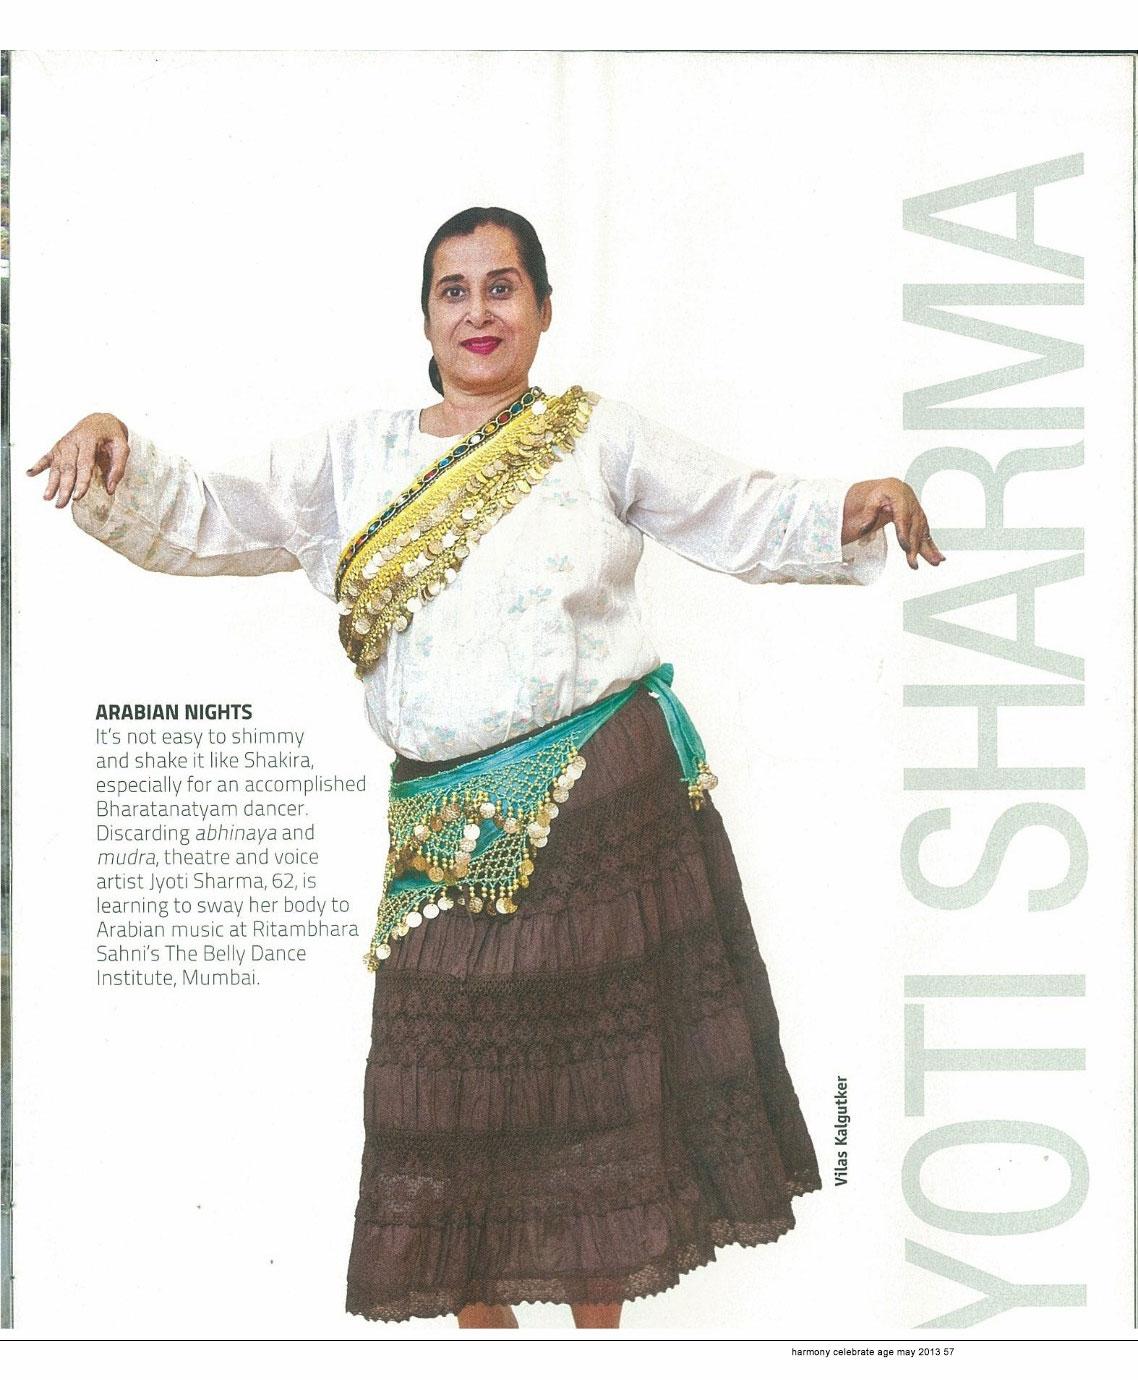 Media coverage for Ritambhara Sahni